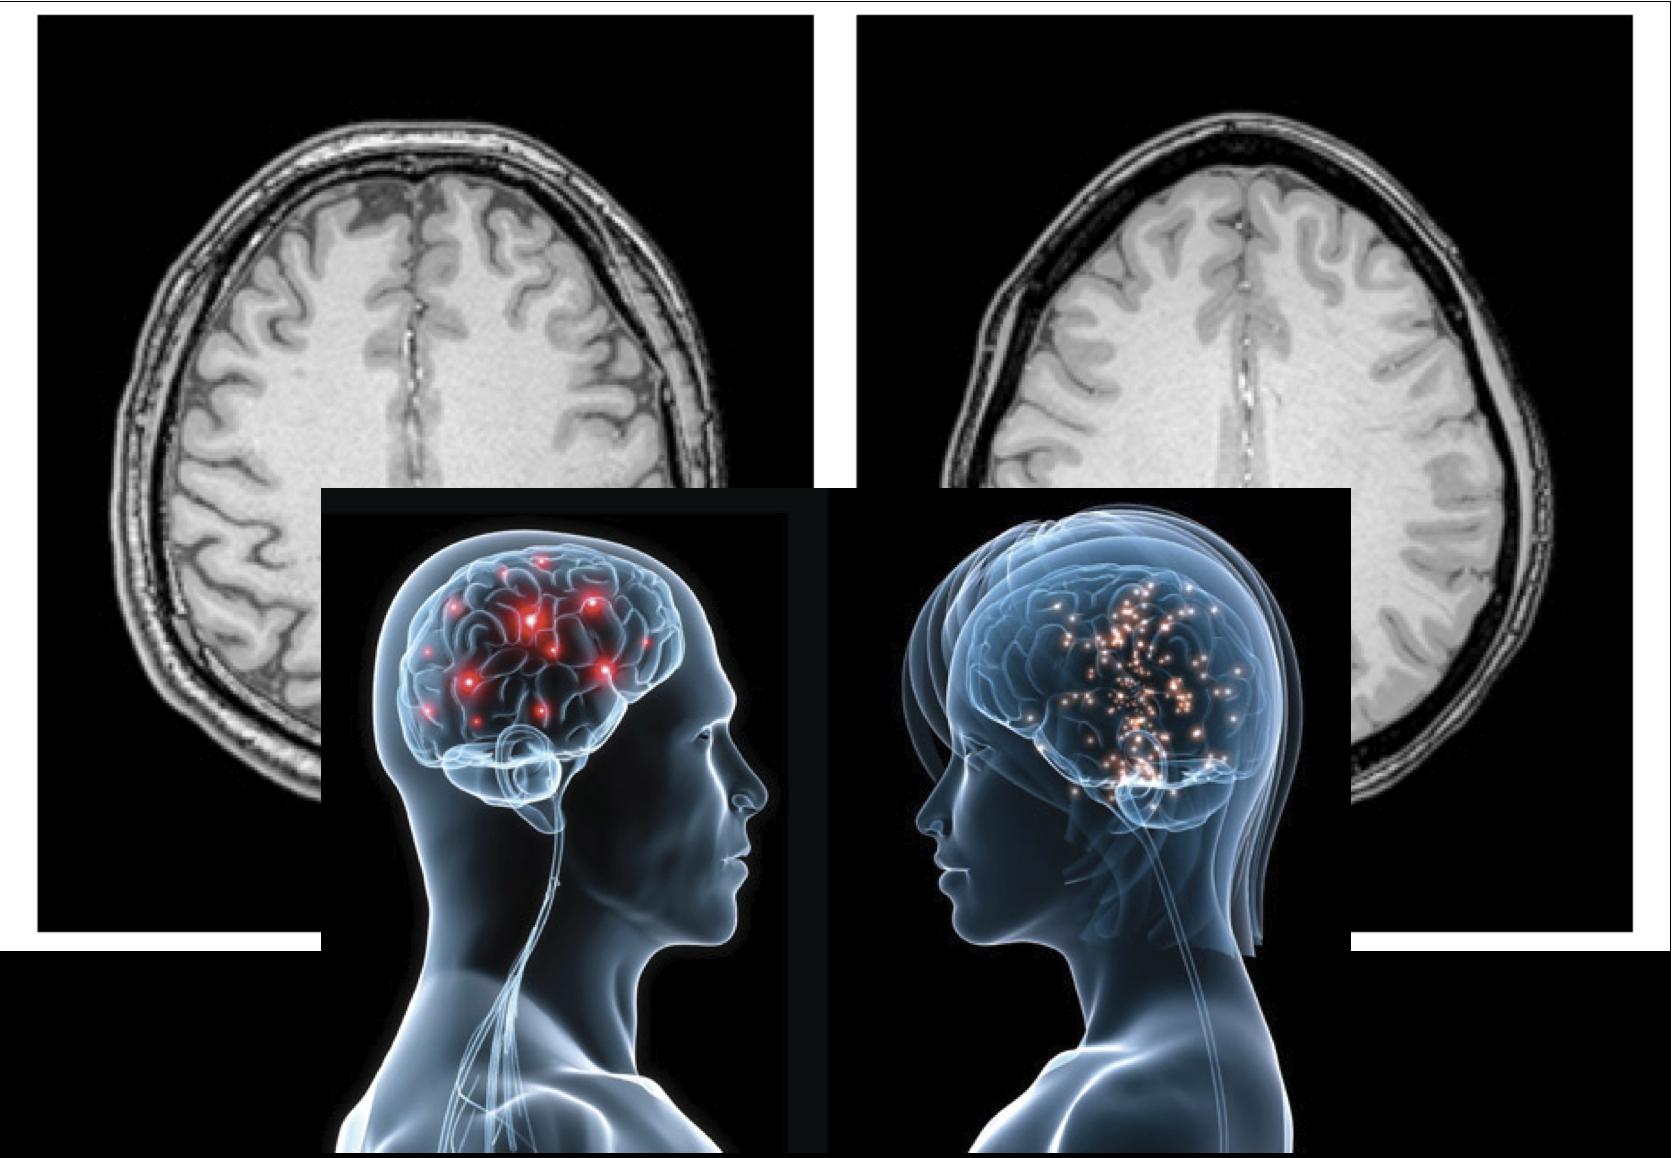 diverse brains neuroimaging in autism reveals individual